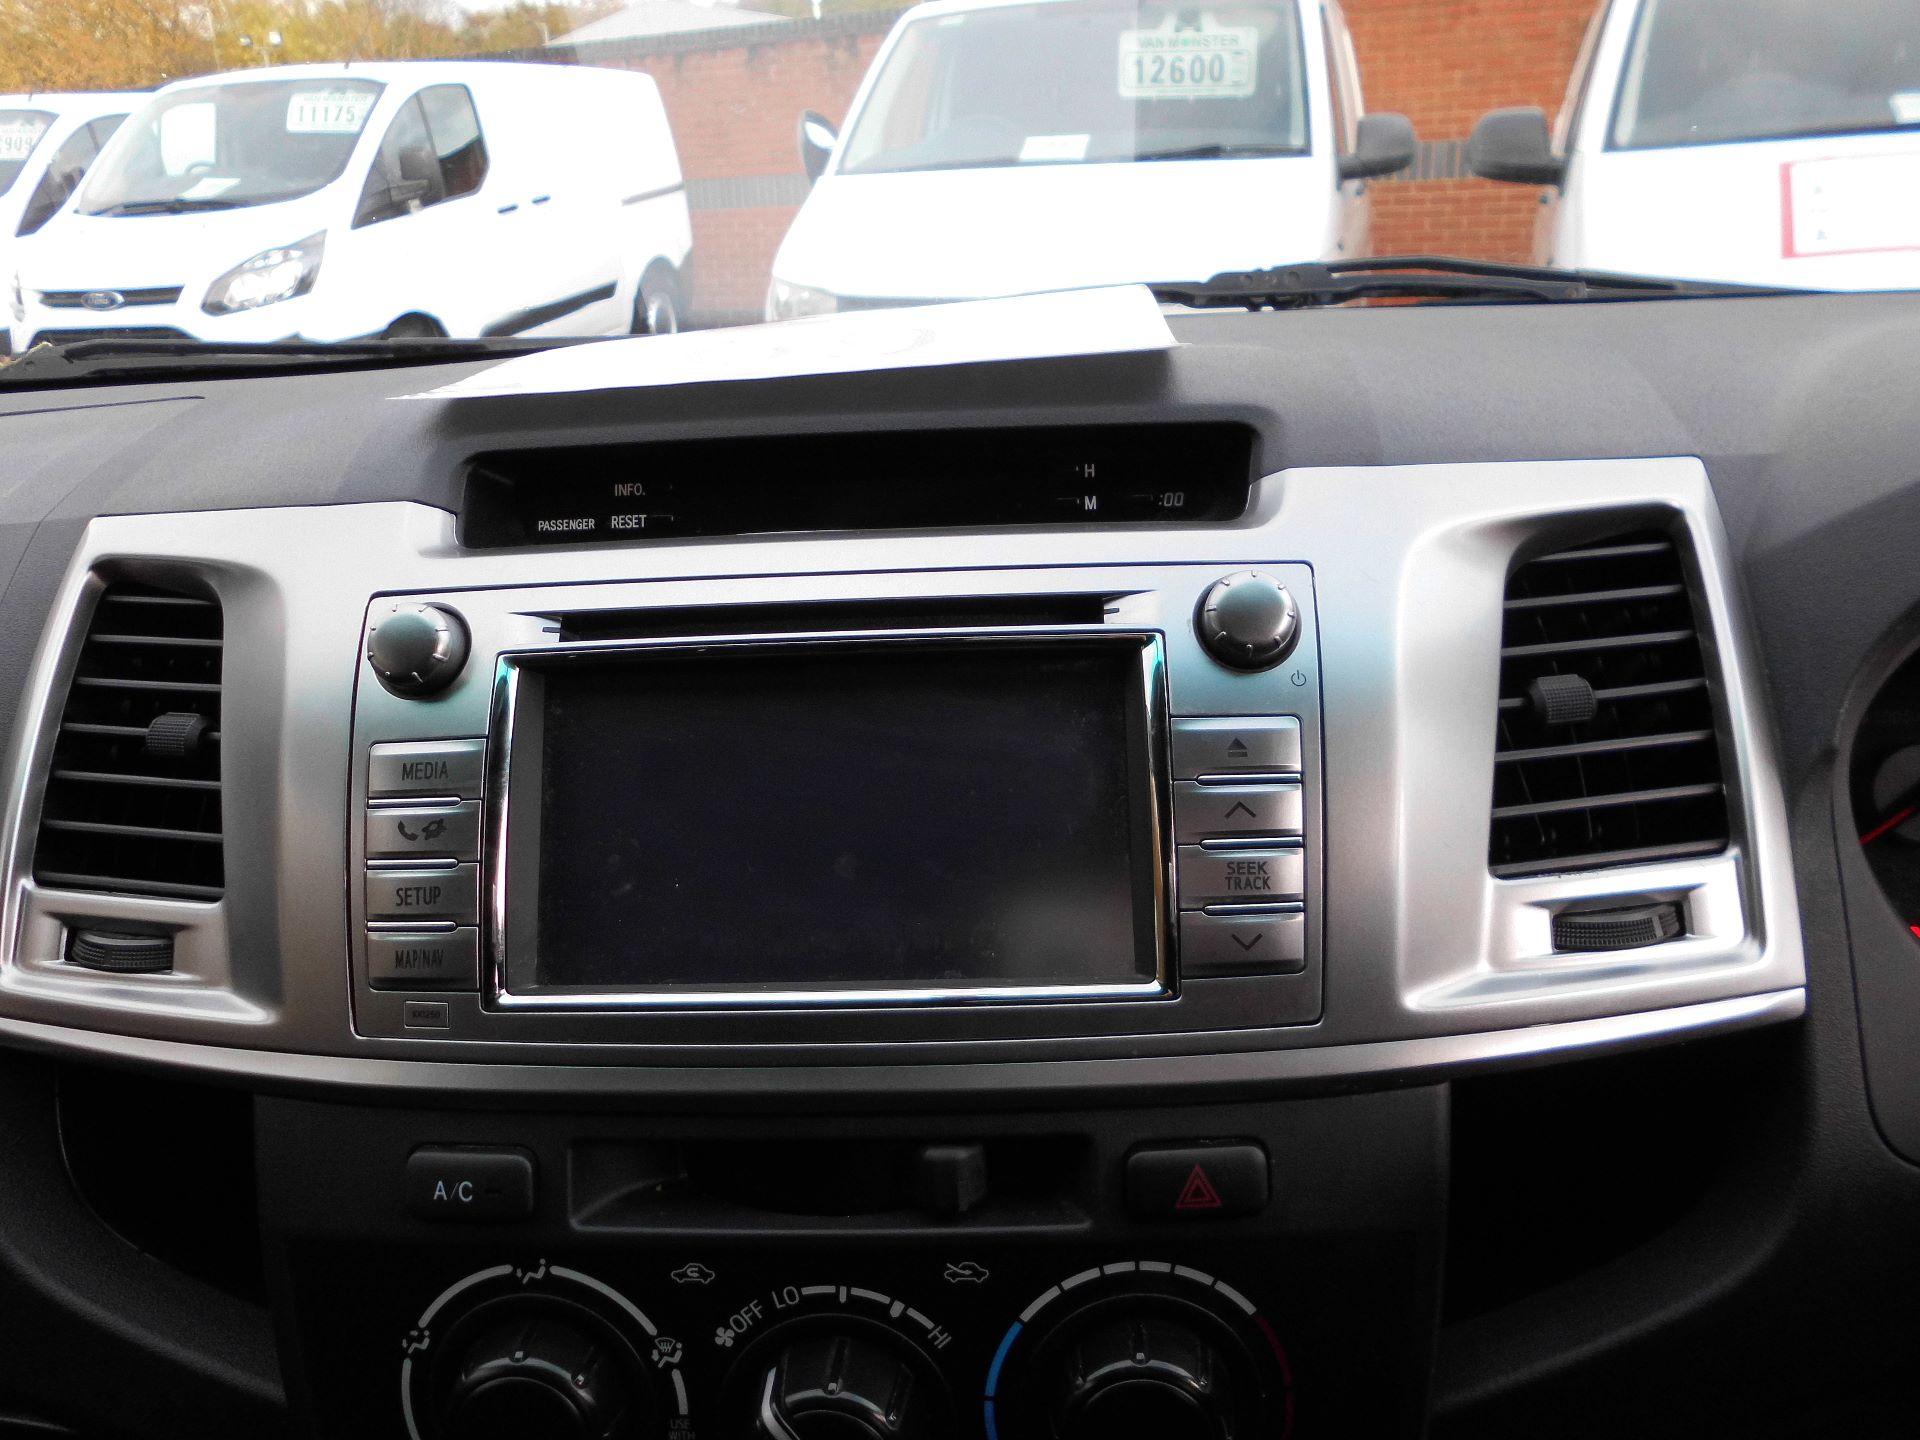 2016 Toyota Hilux Icon D/Cab Pick Up 2.5 D-4D 4Wd 144 (DN65NCO) Image 6